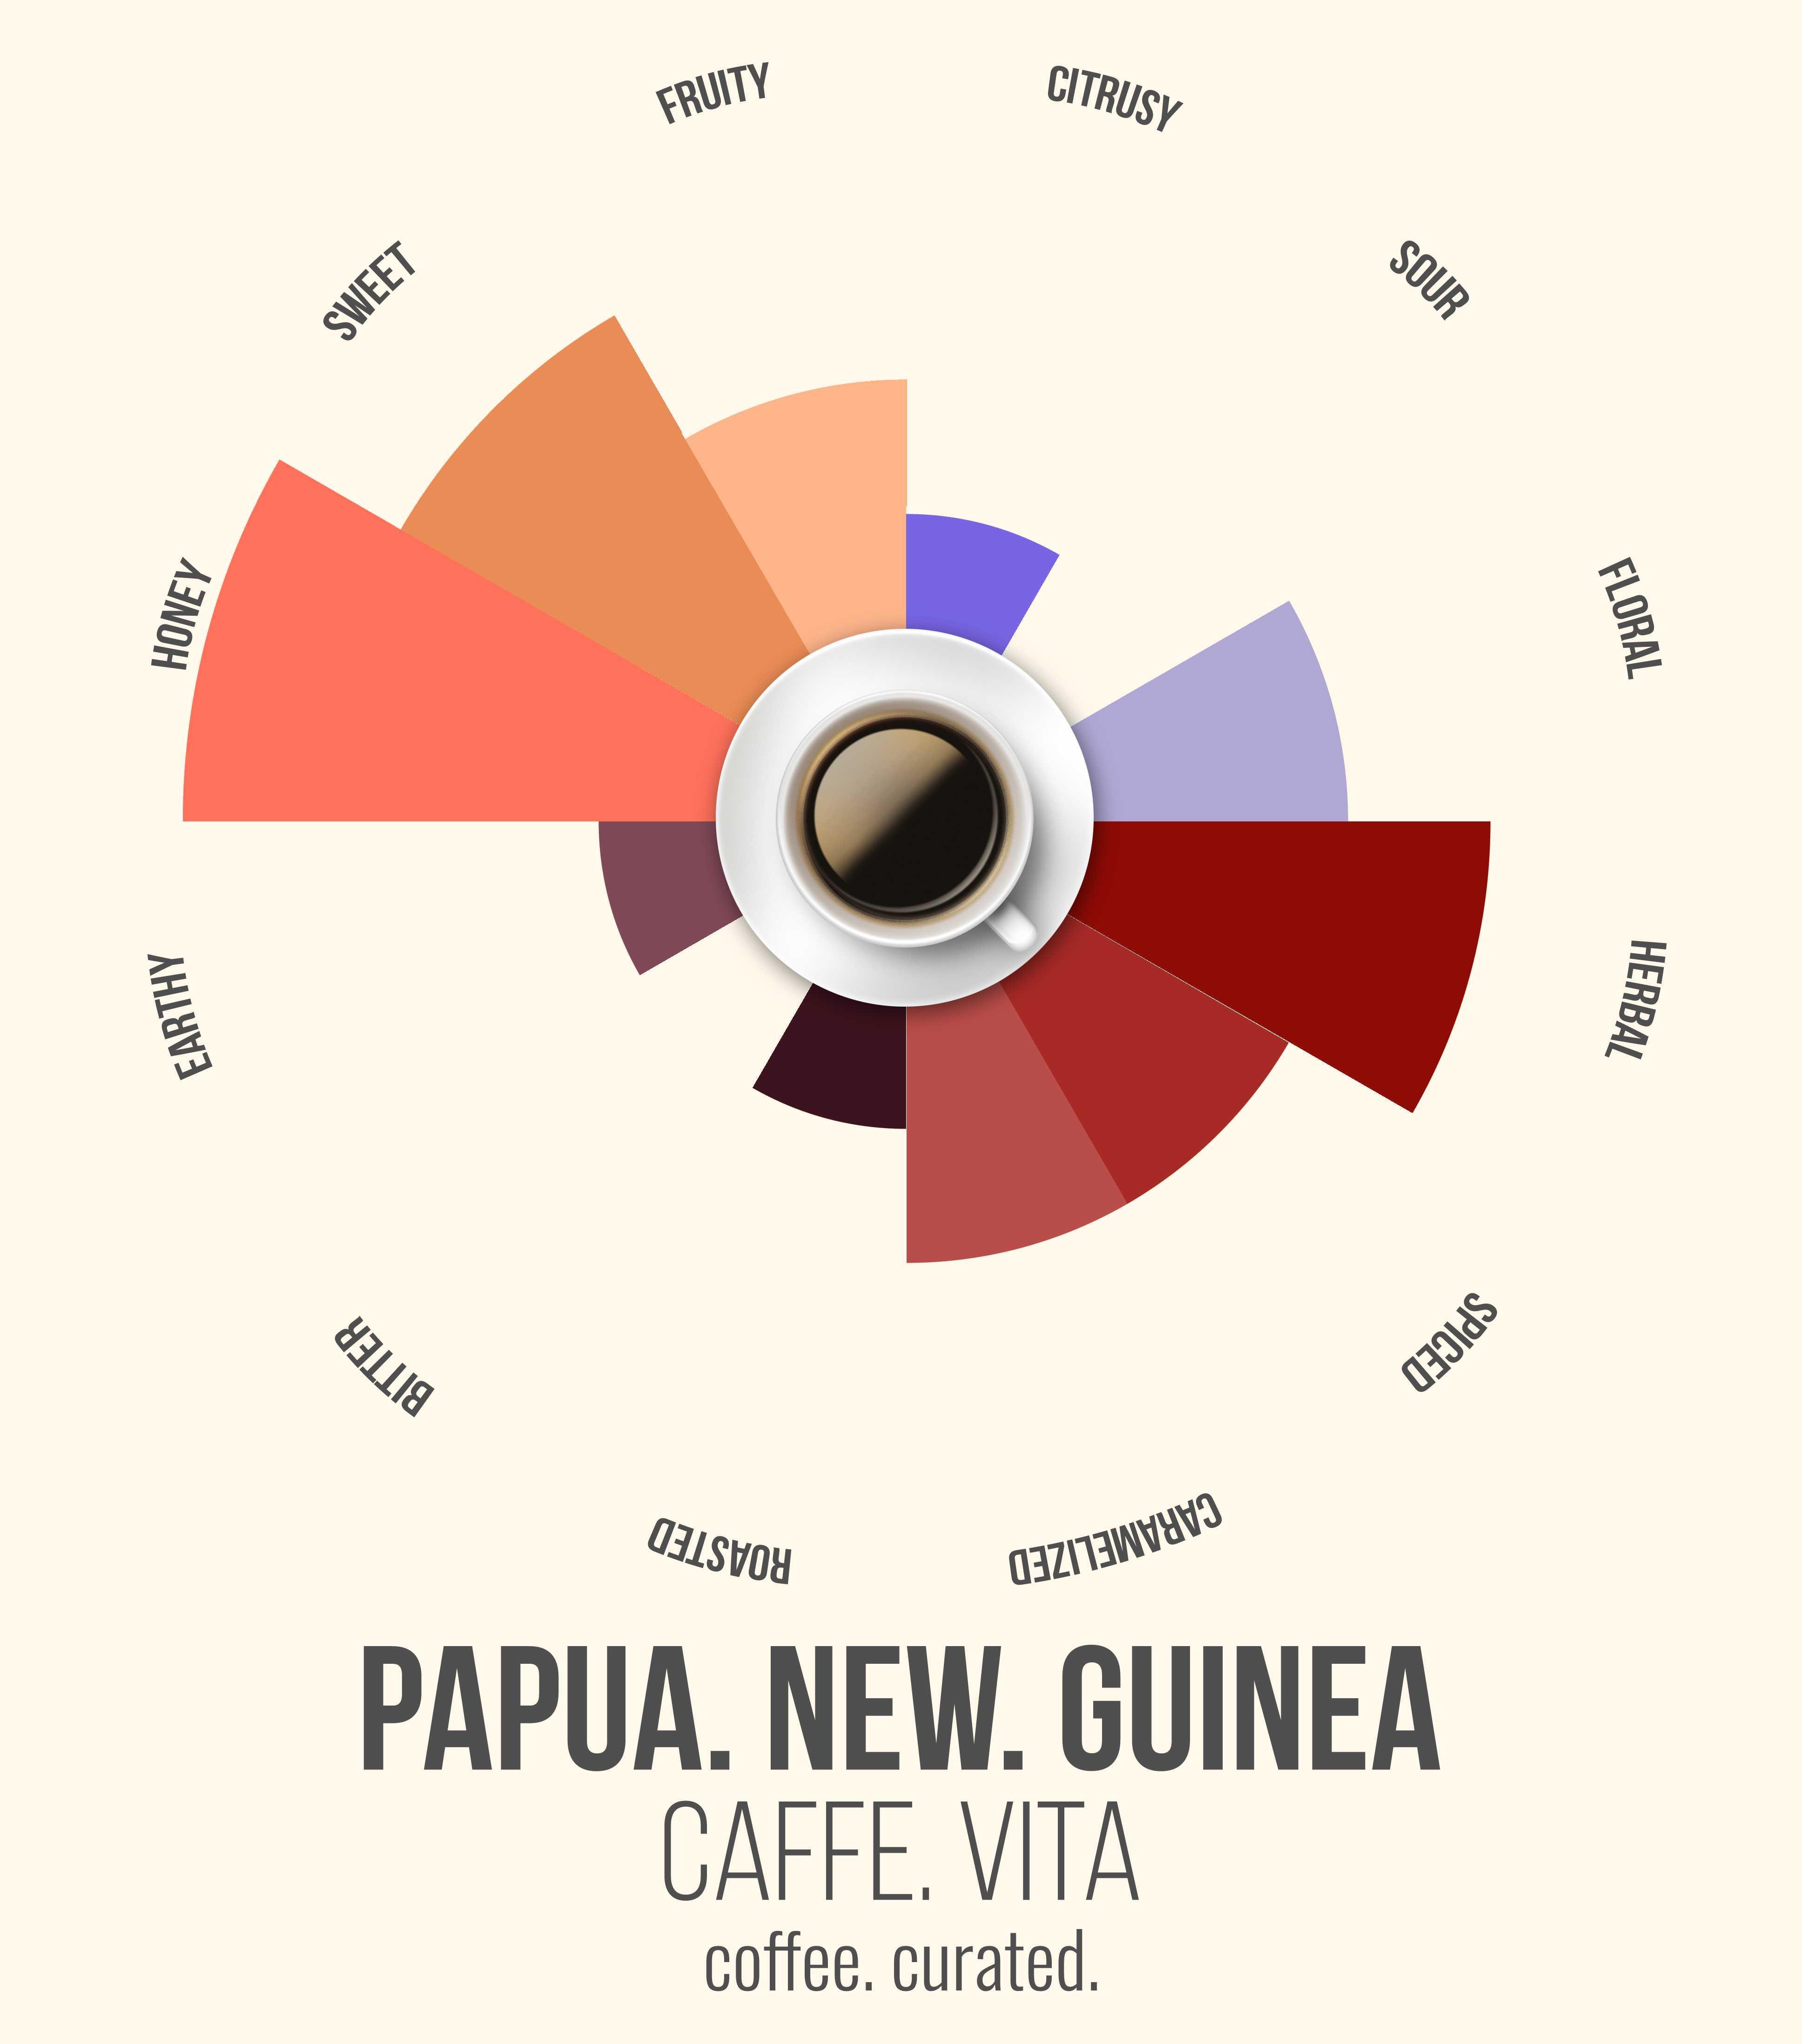 Caffe Vita PAPUA New Guinea